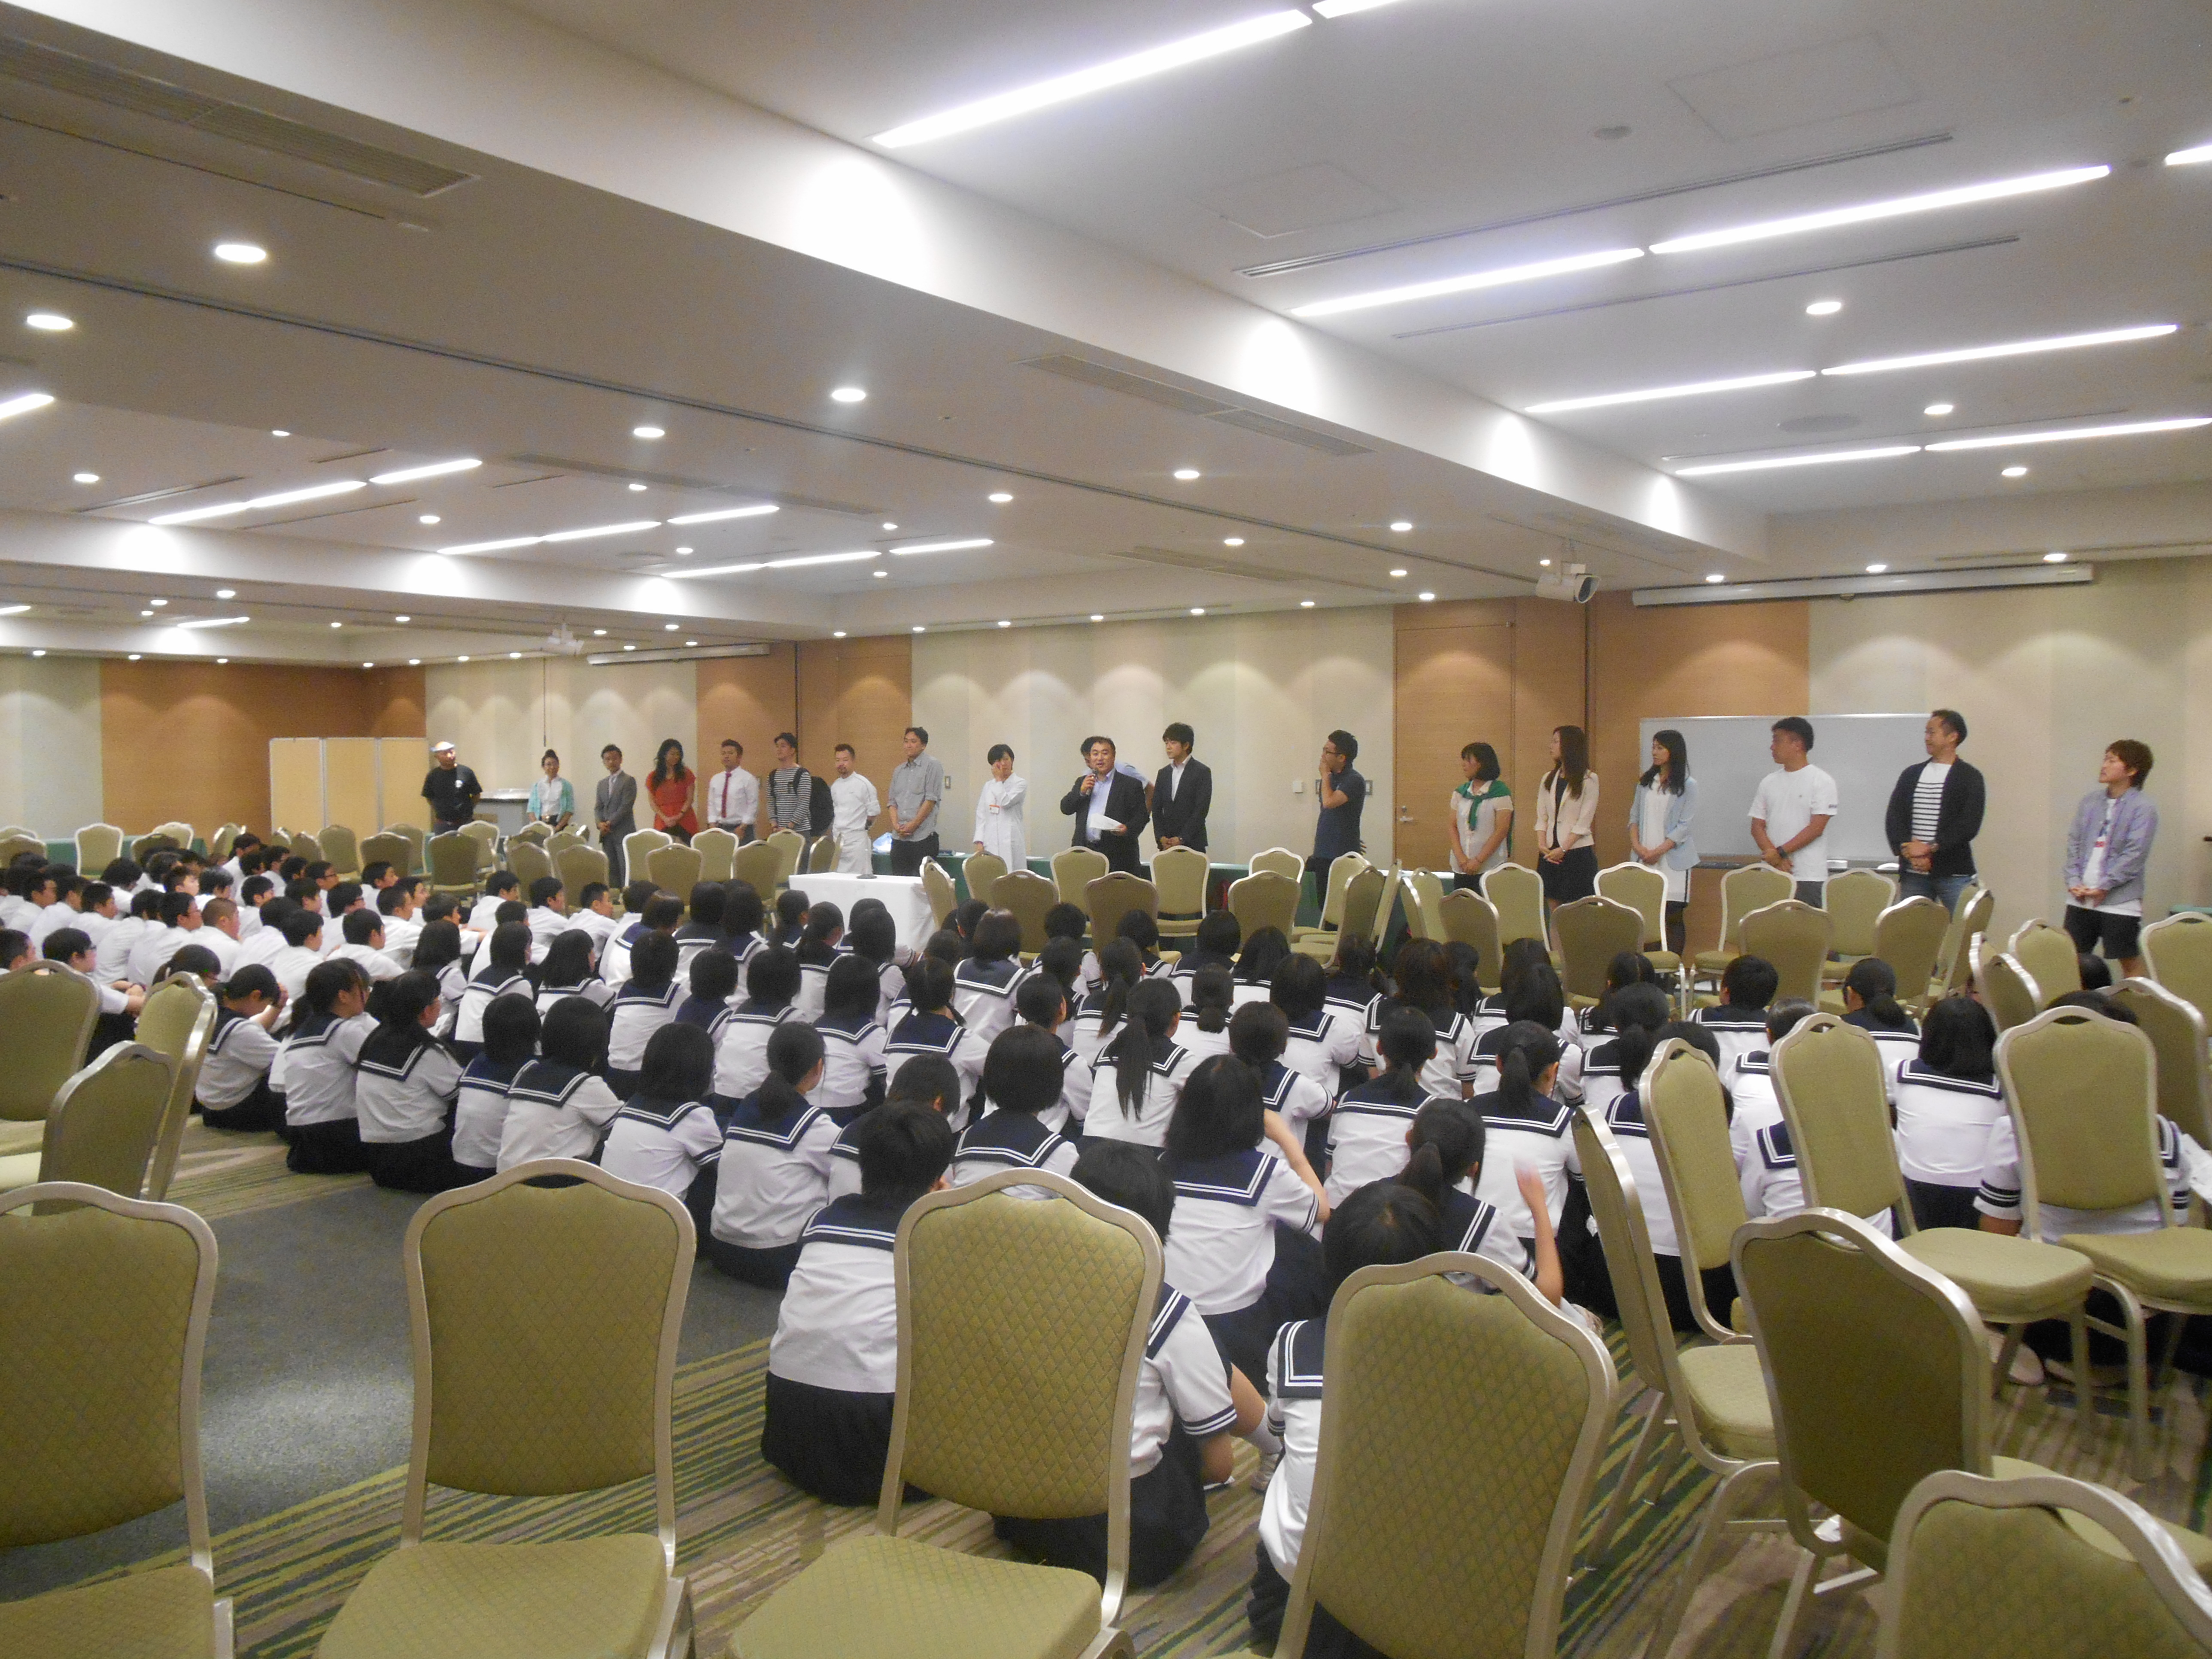 DSCN437243213421 - AOsukiフューチャーズゼミ2019年5月21日開催